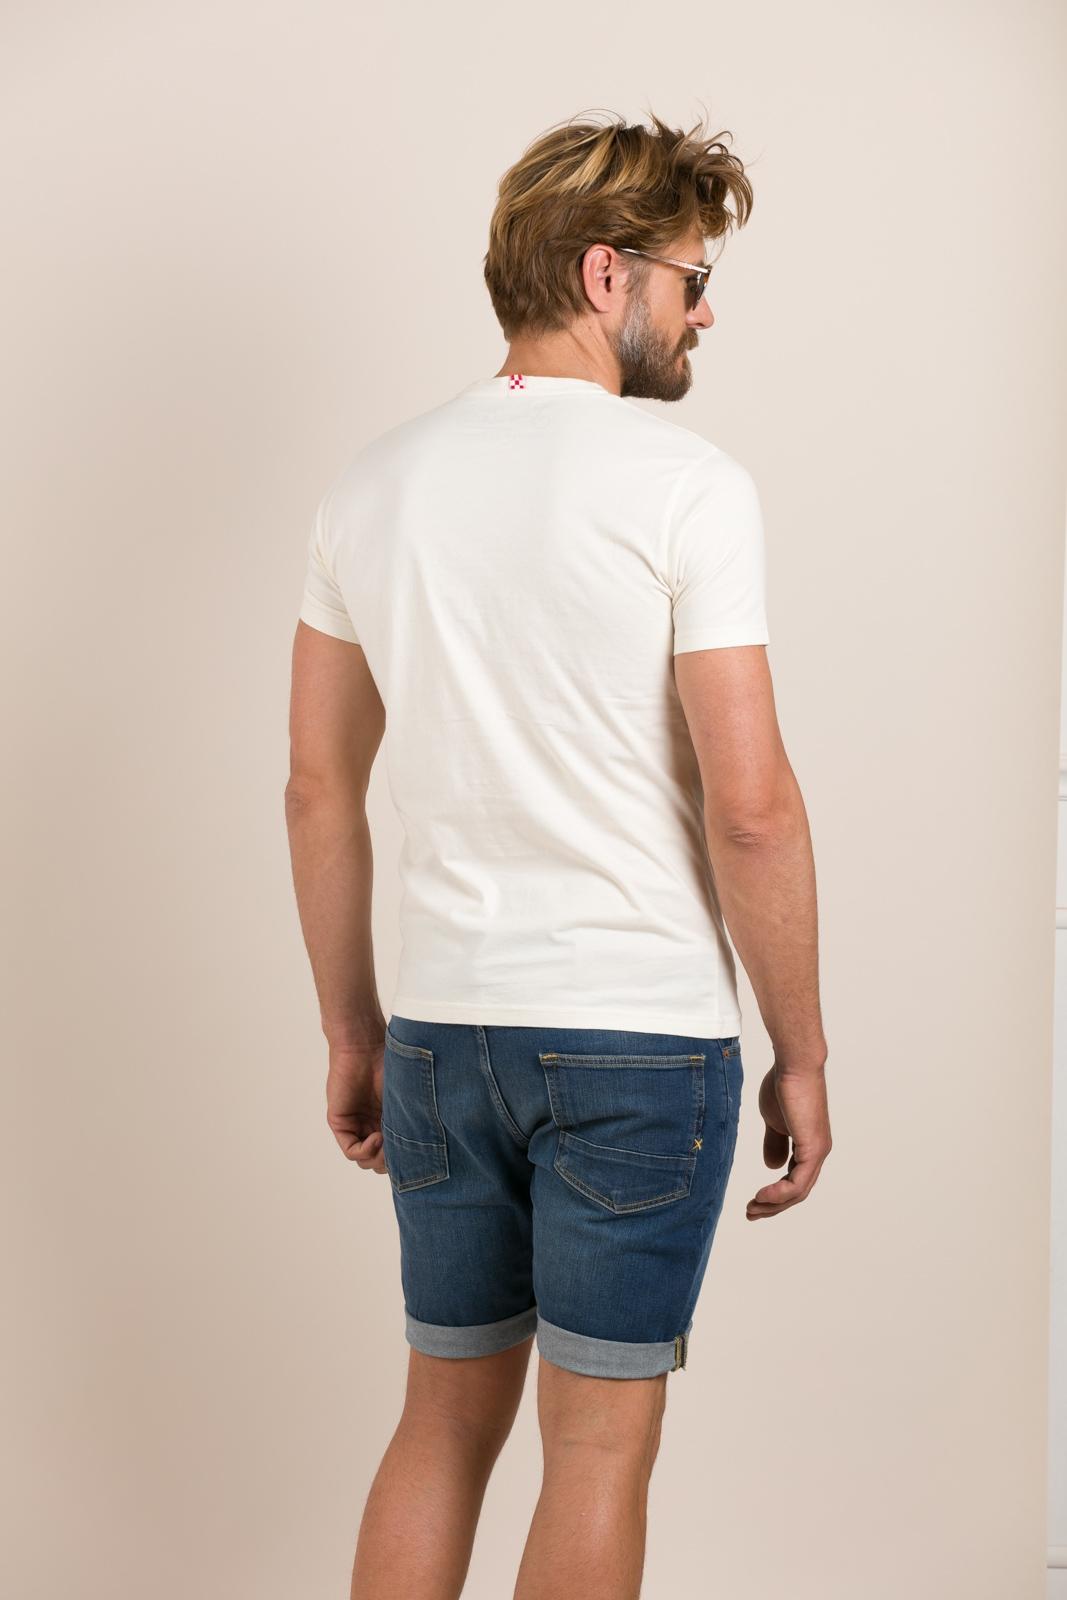 Camiseta MC2 estampado gráfico surf - Ítem1